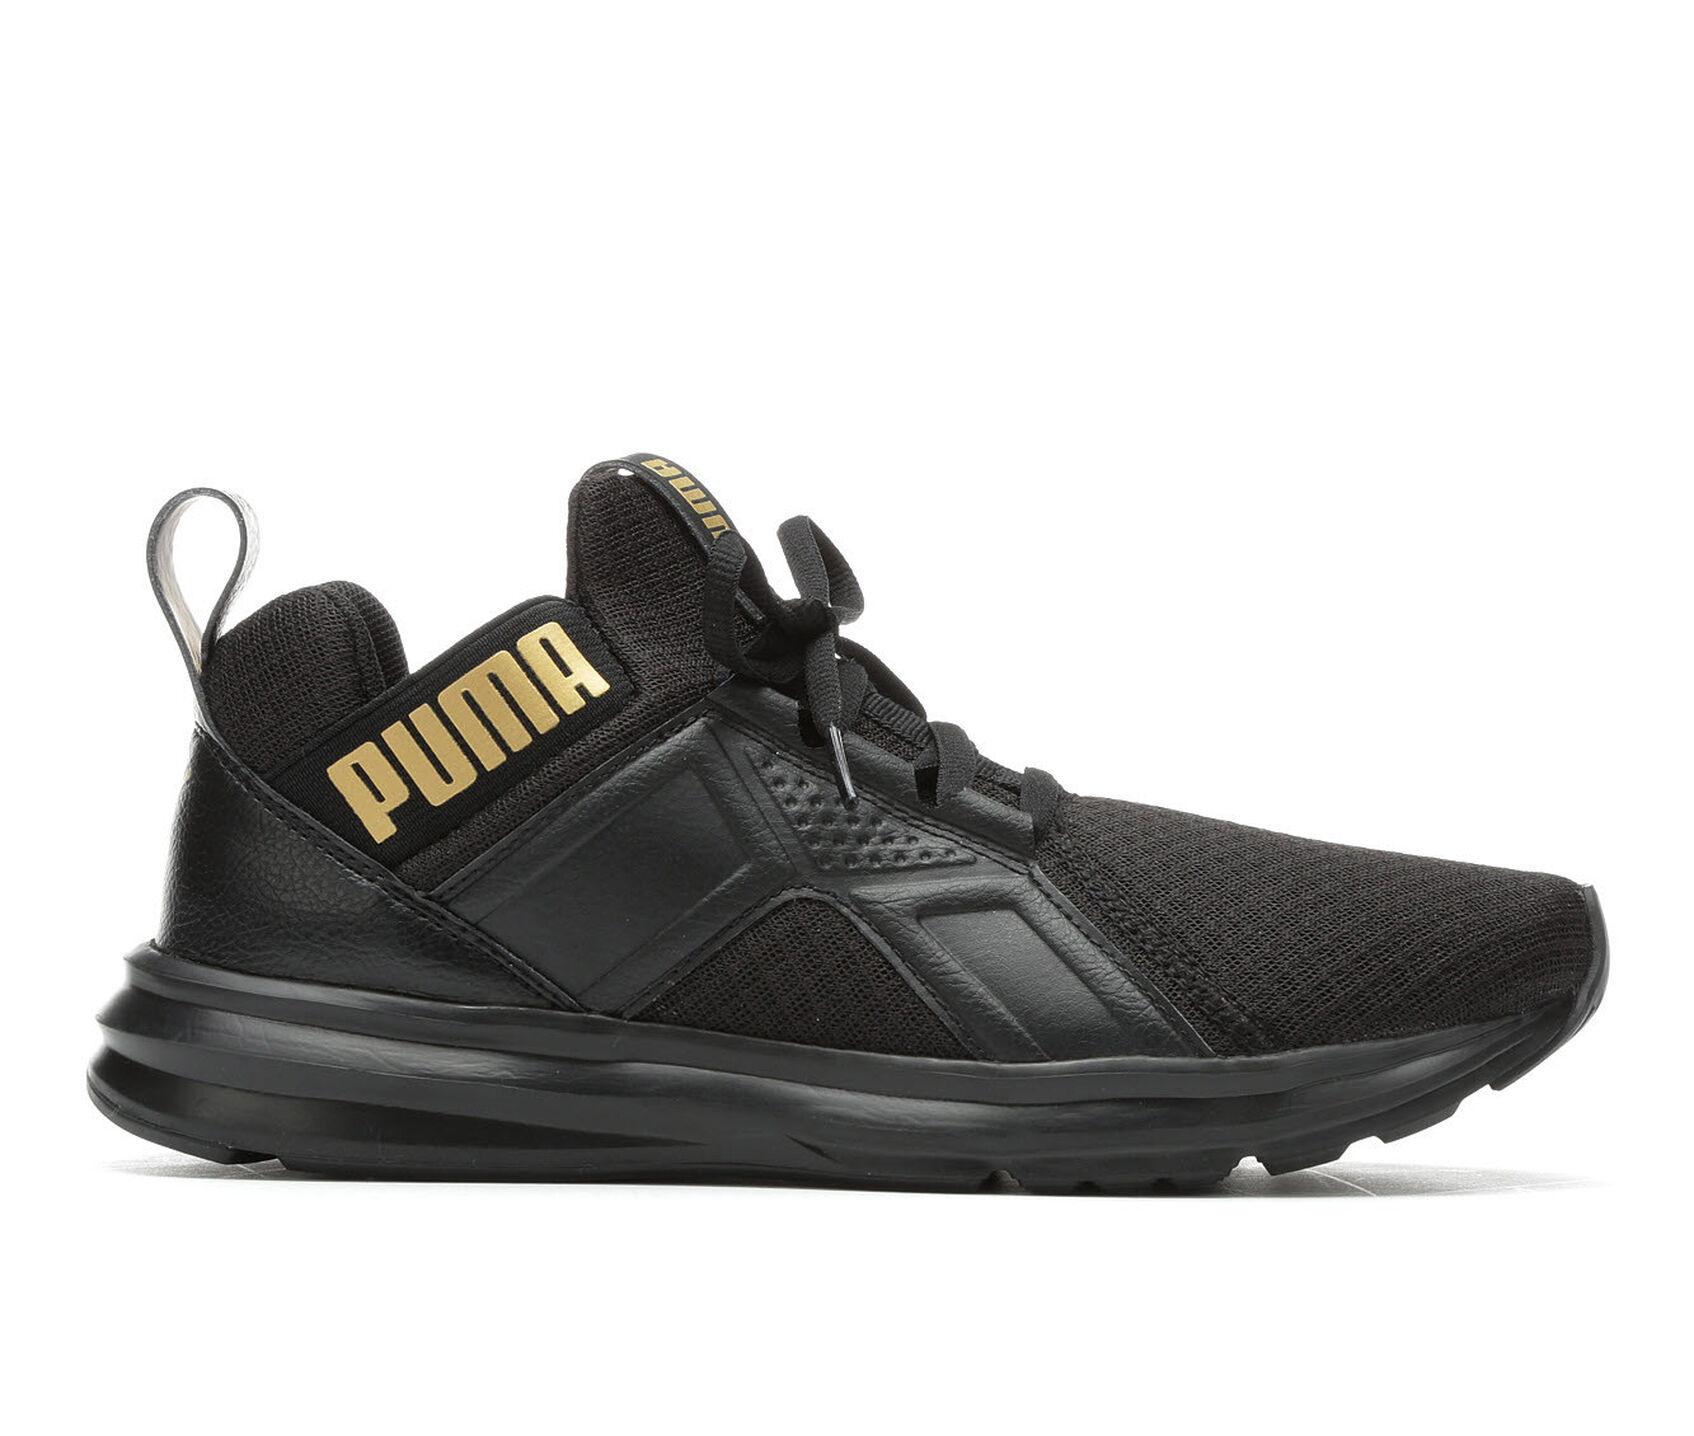 5faa9865145 Women's Puma Enzo Varsity High Top Slip-On Sneakers